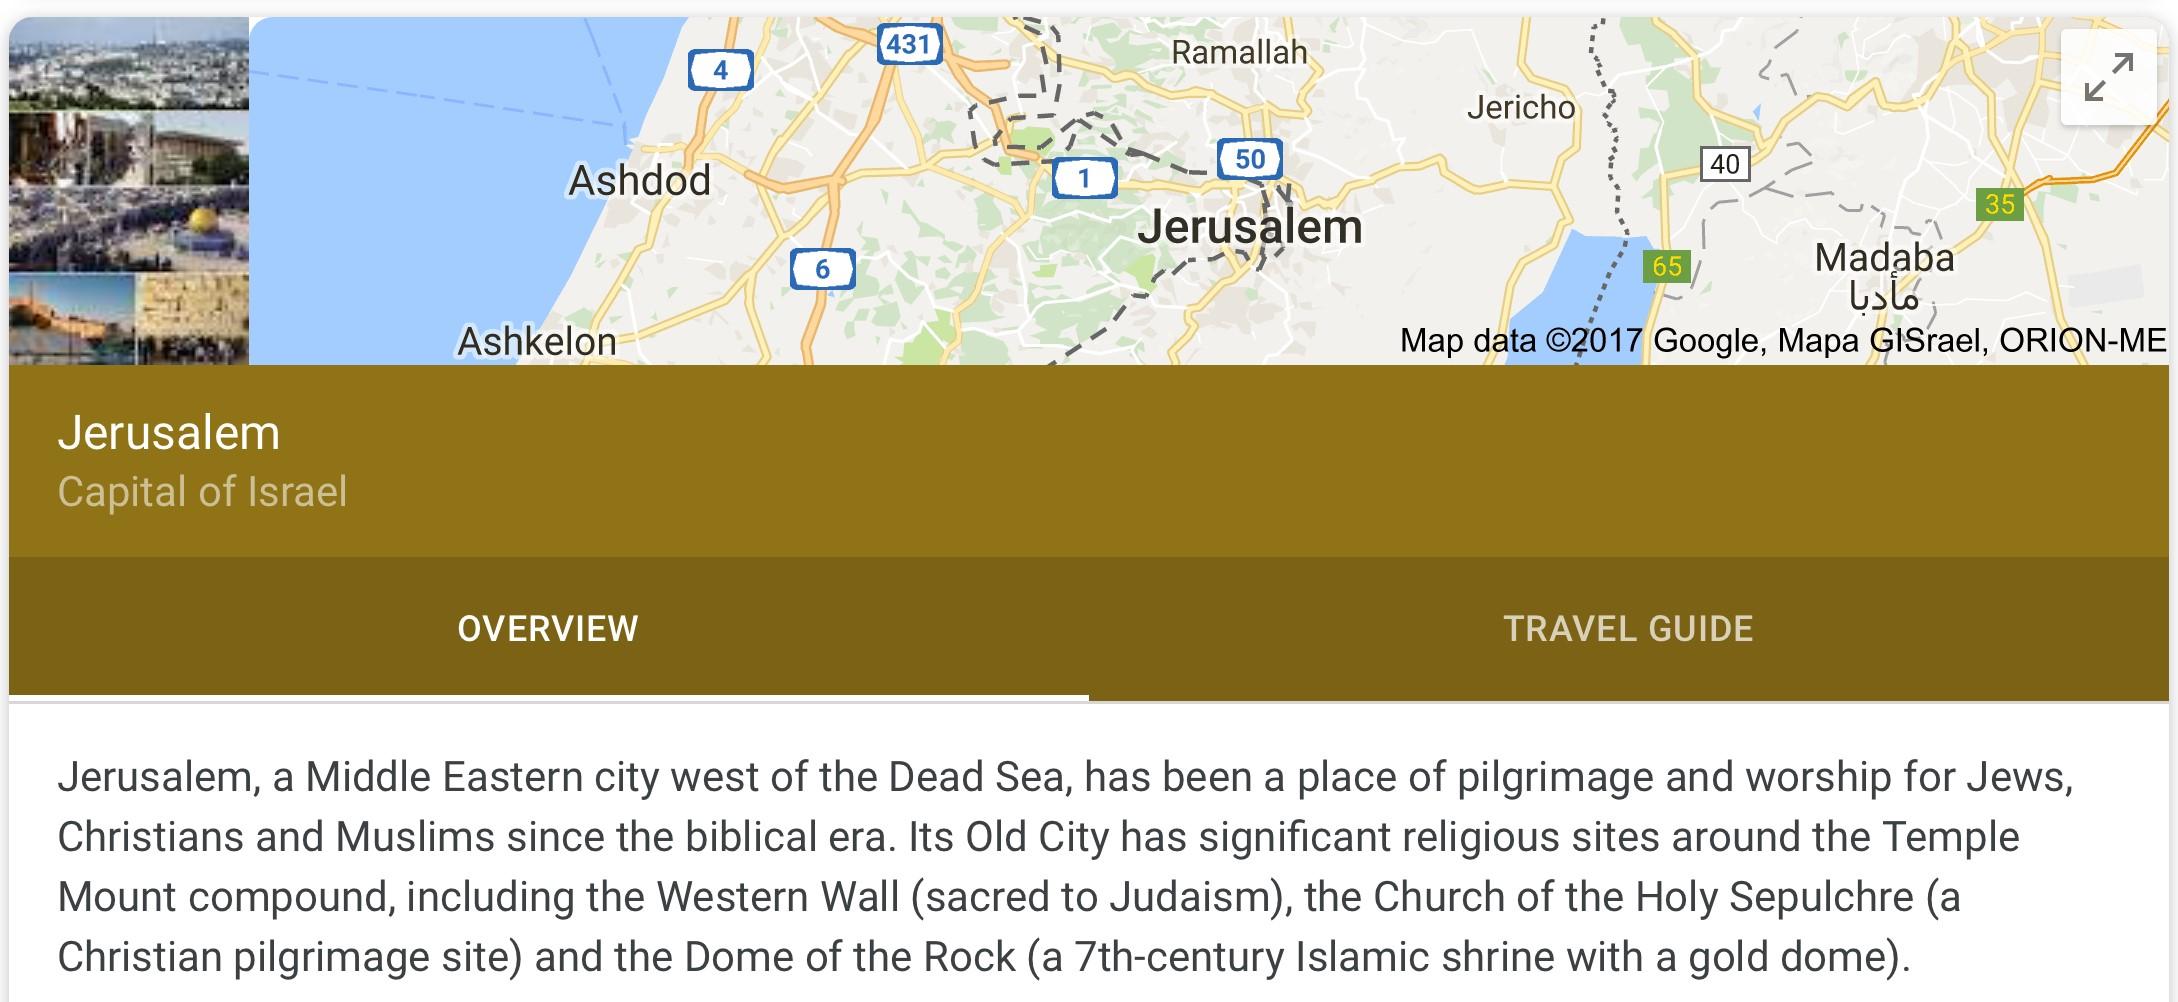 morts israel palestine juillet 2017